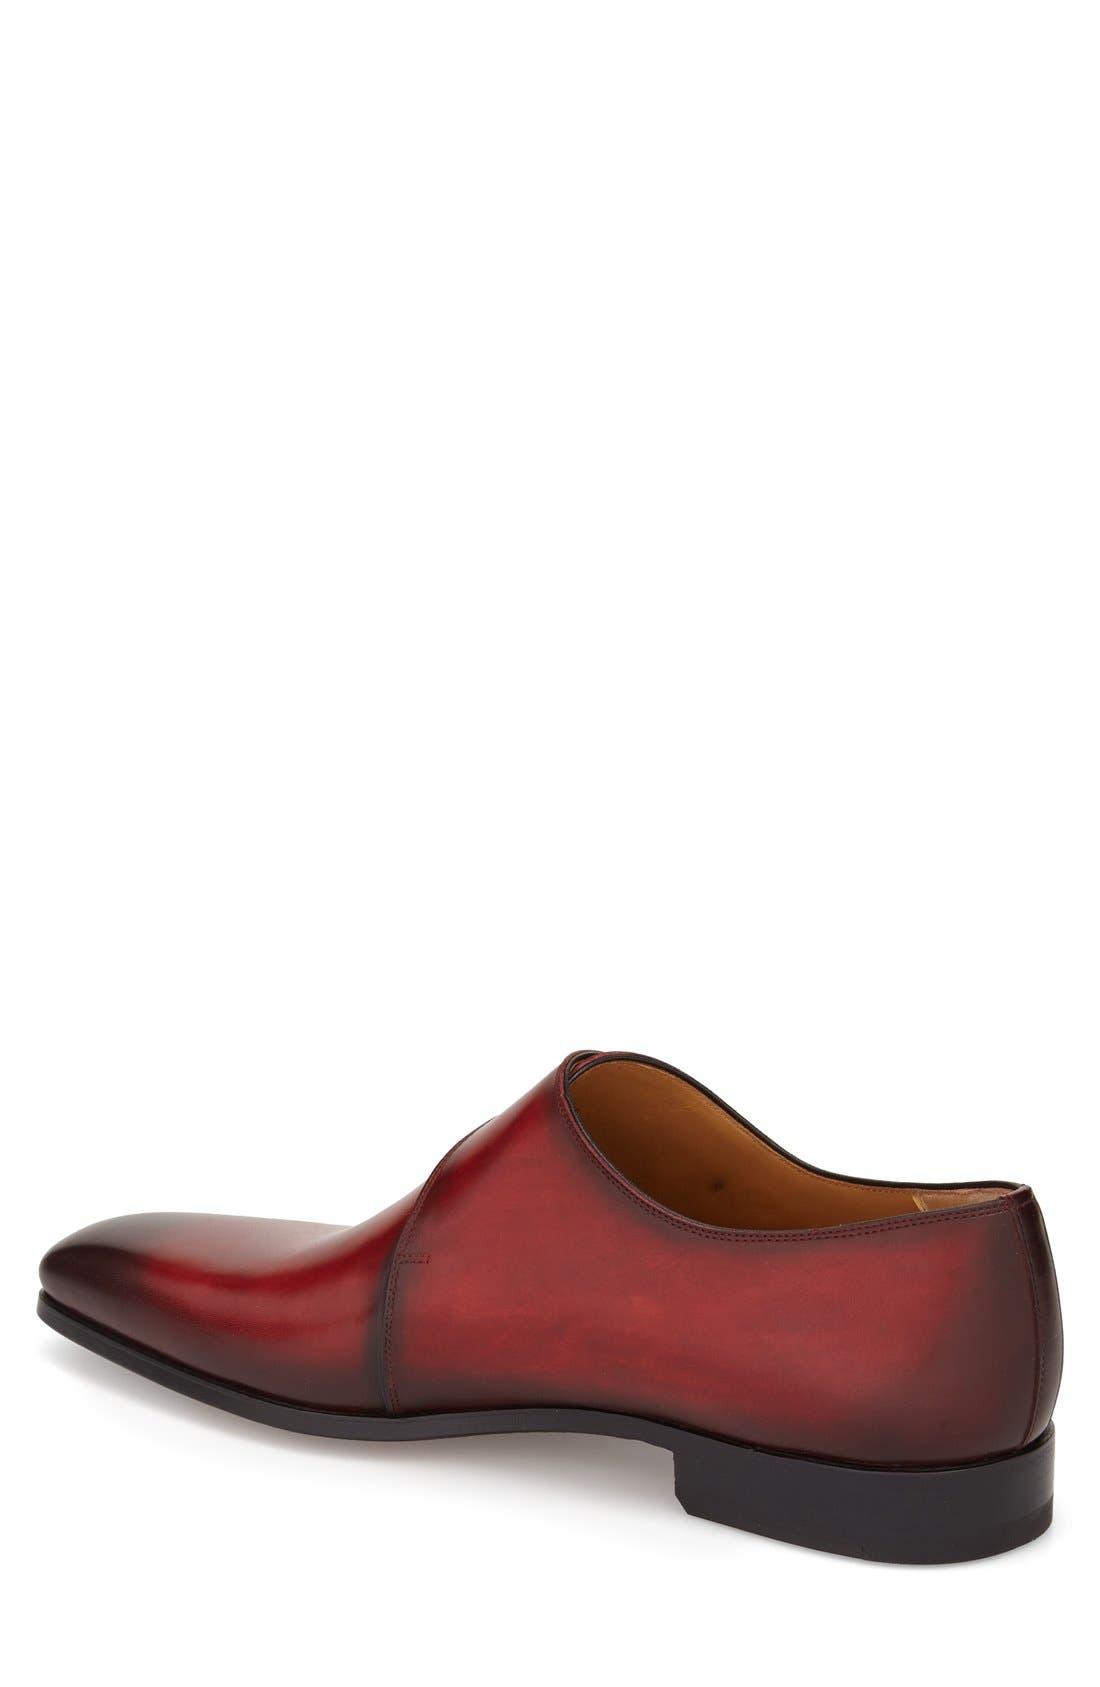 Efren Monk Strap Shoe,                             Alternate thumbnail 2, color,                             Red